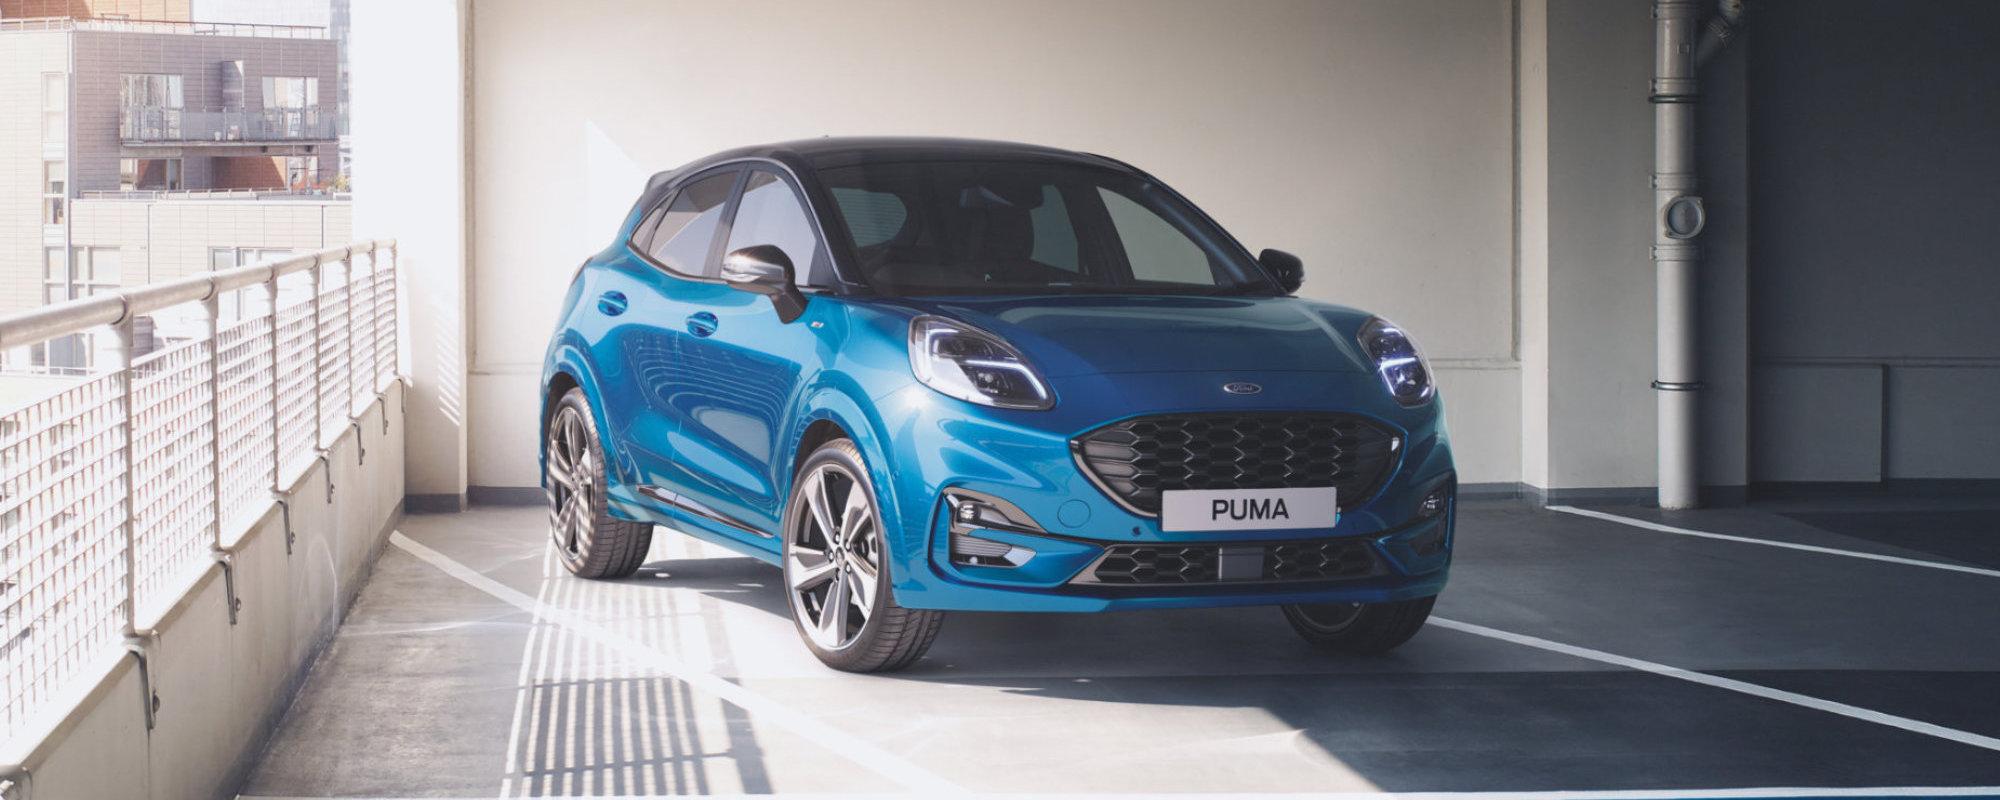 Om Arendal Auto - Ford Puma